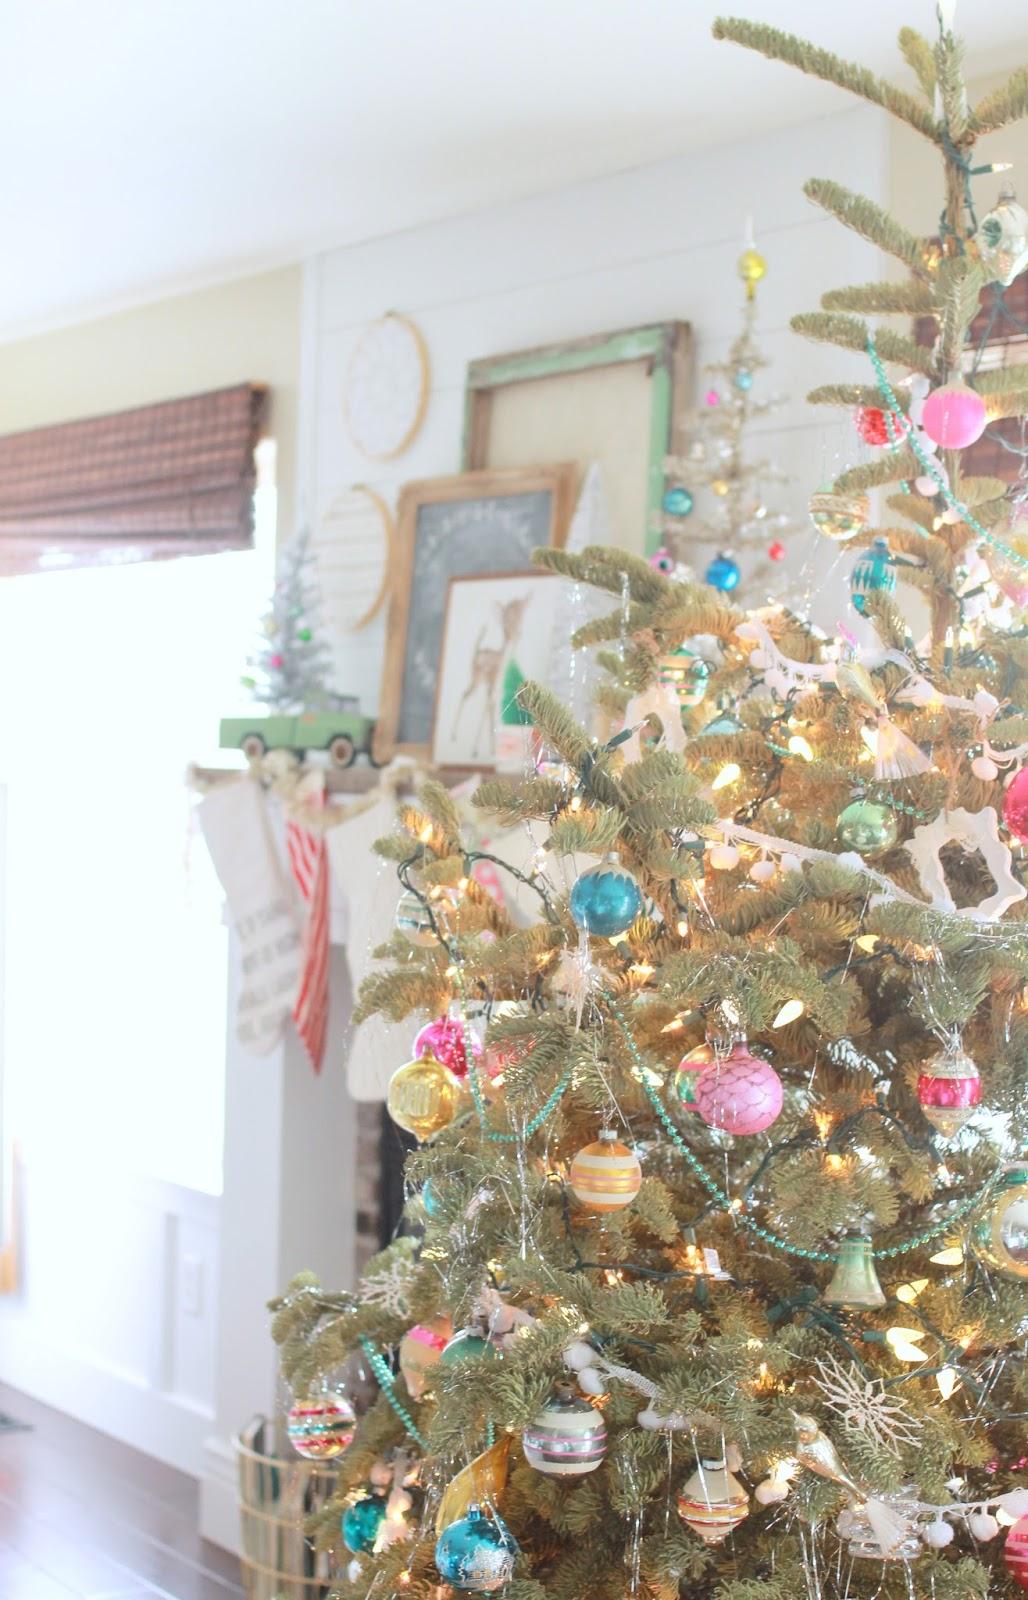 Whimsical Treasures: Kitschy Vintage Christmas Tour (part 1)